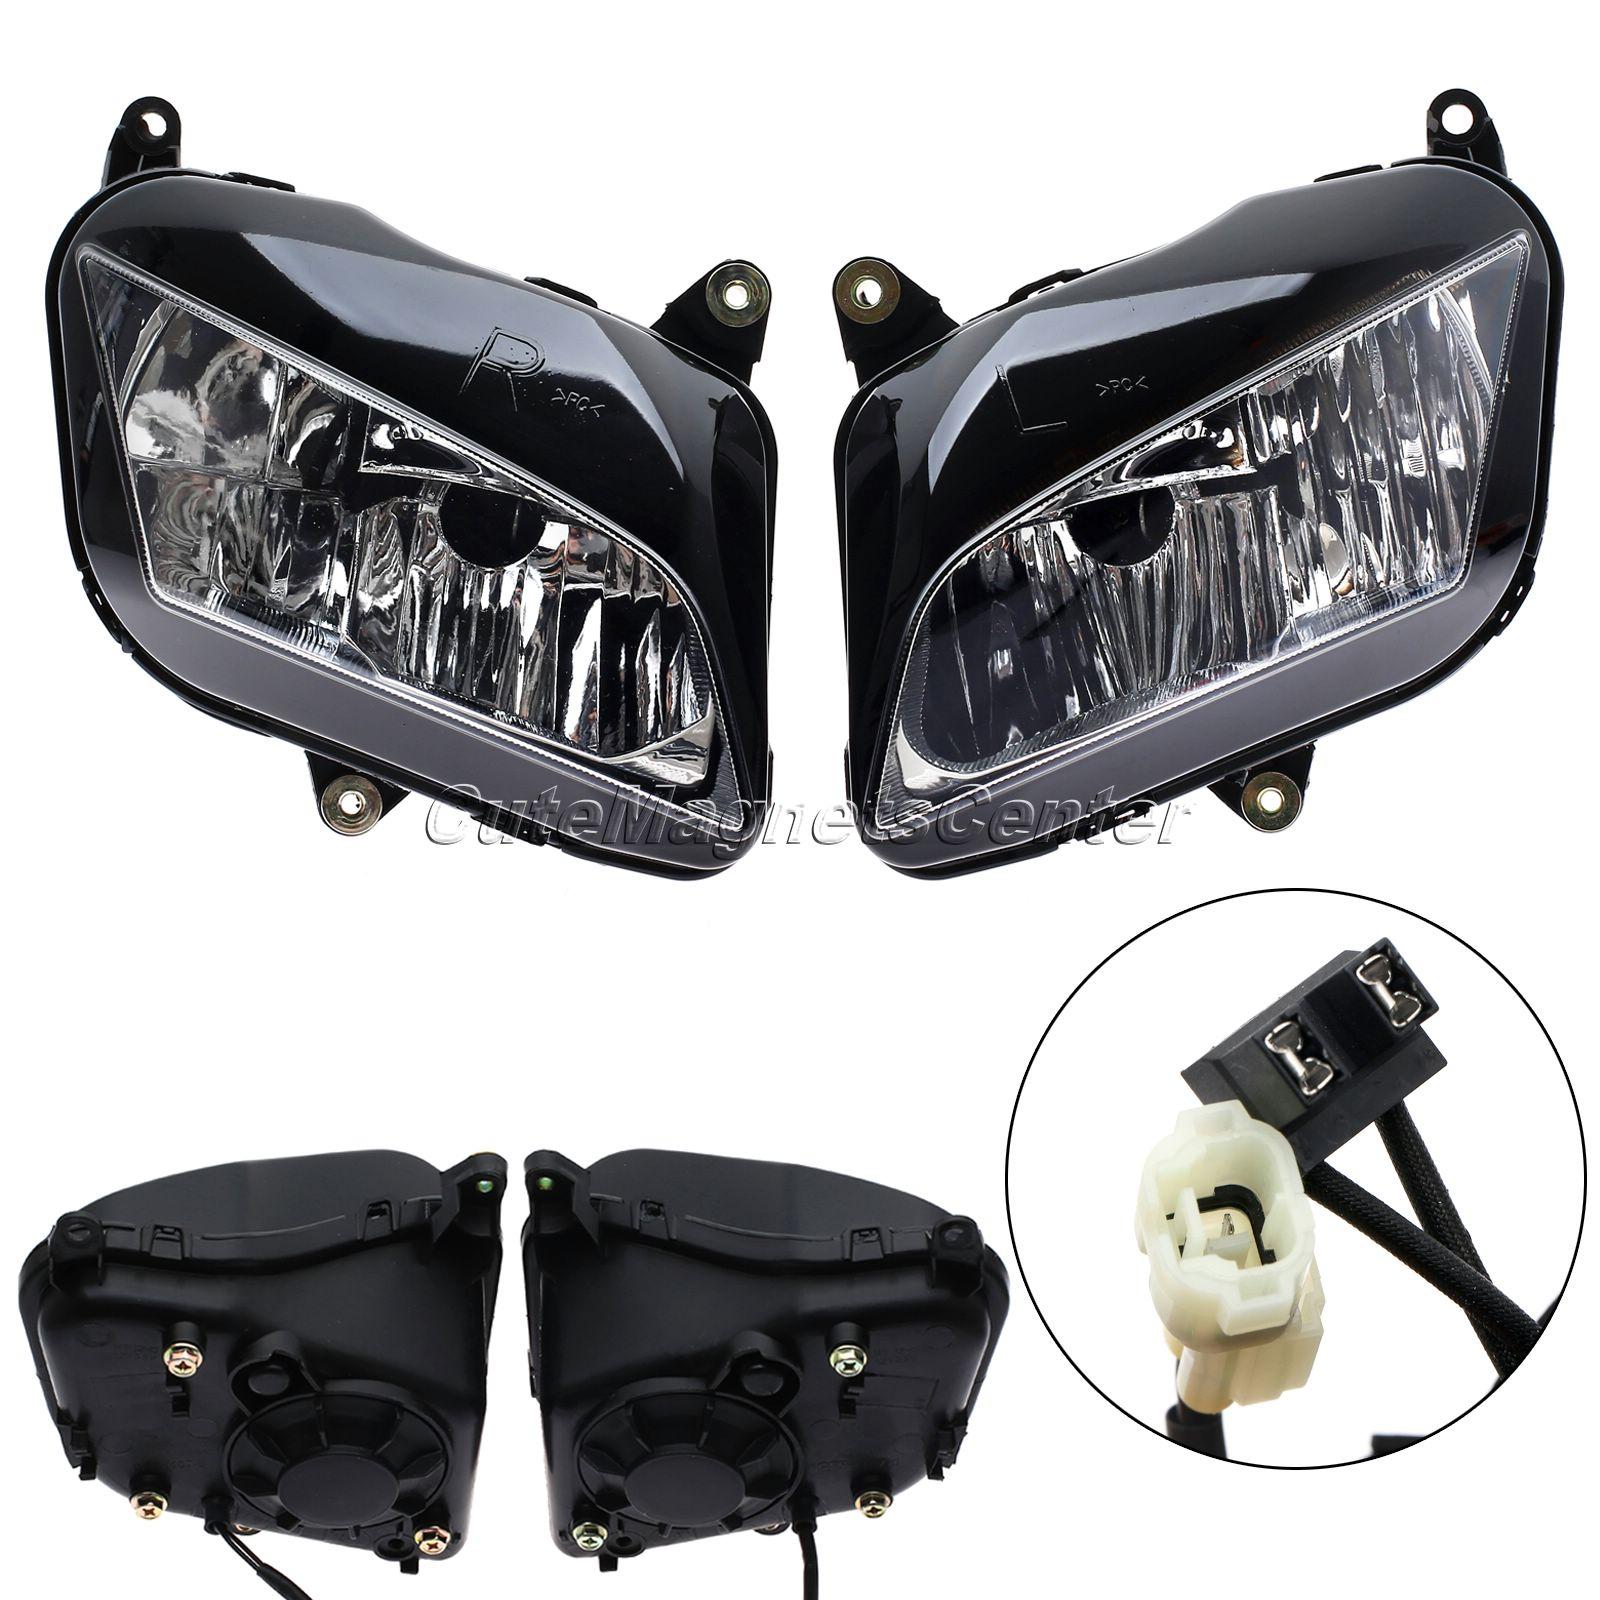 ФОТО 1 Pair Motorcycle Front Headlight Lamp Head Light Assembly Motorbike Head Lamp Lighting For Honda CBR600RR 2007-2012 08 09 10 11